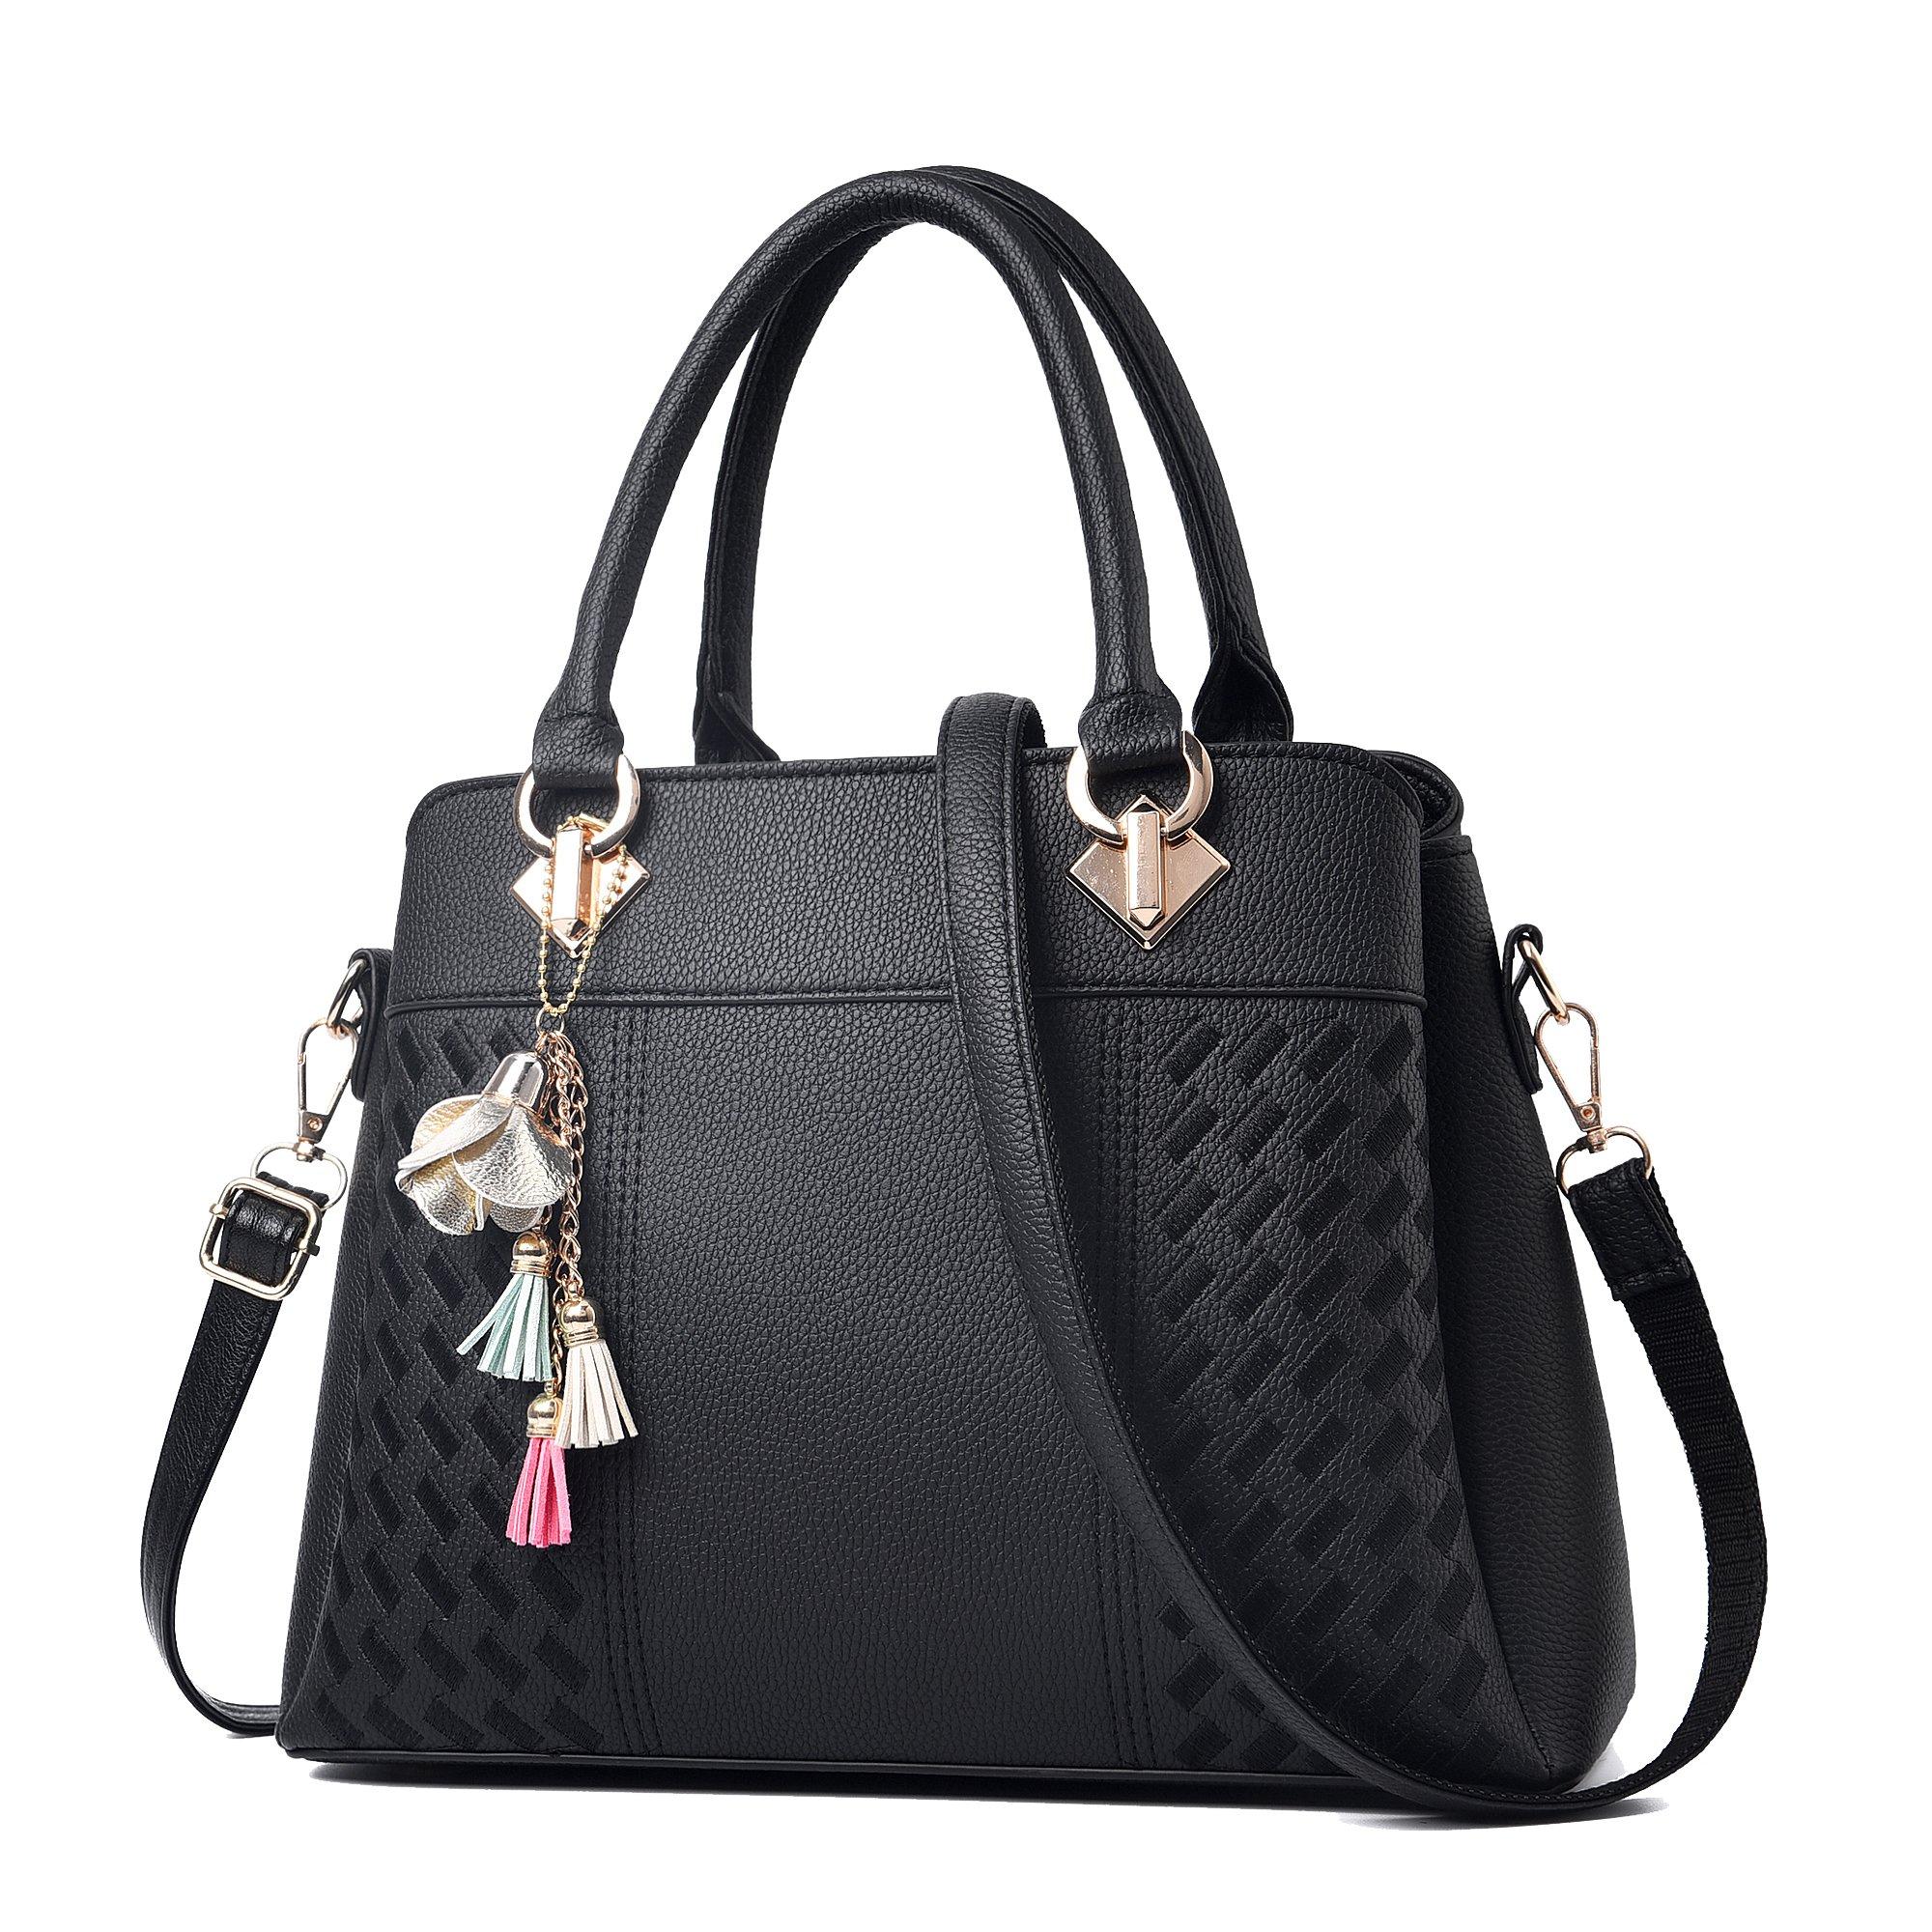 Womens Purses and Handbags Ladies Designer Satchel Tote Bag Shoulder Bags, Black